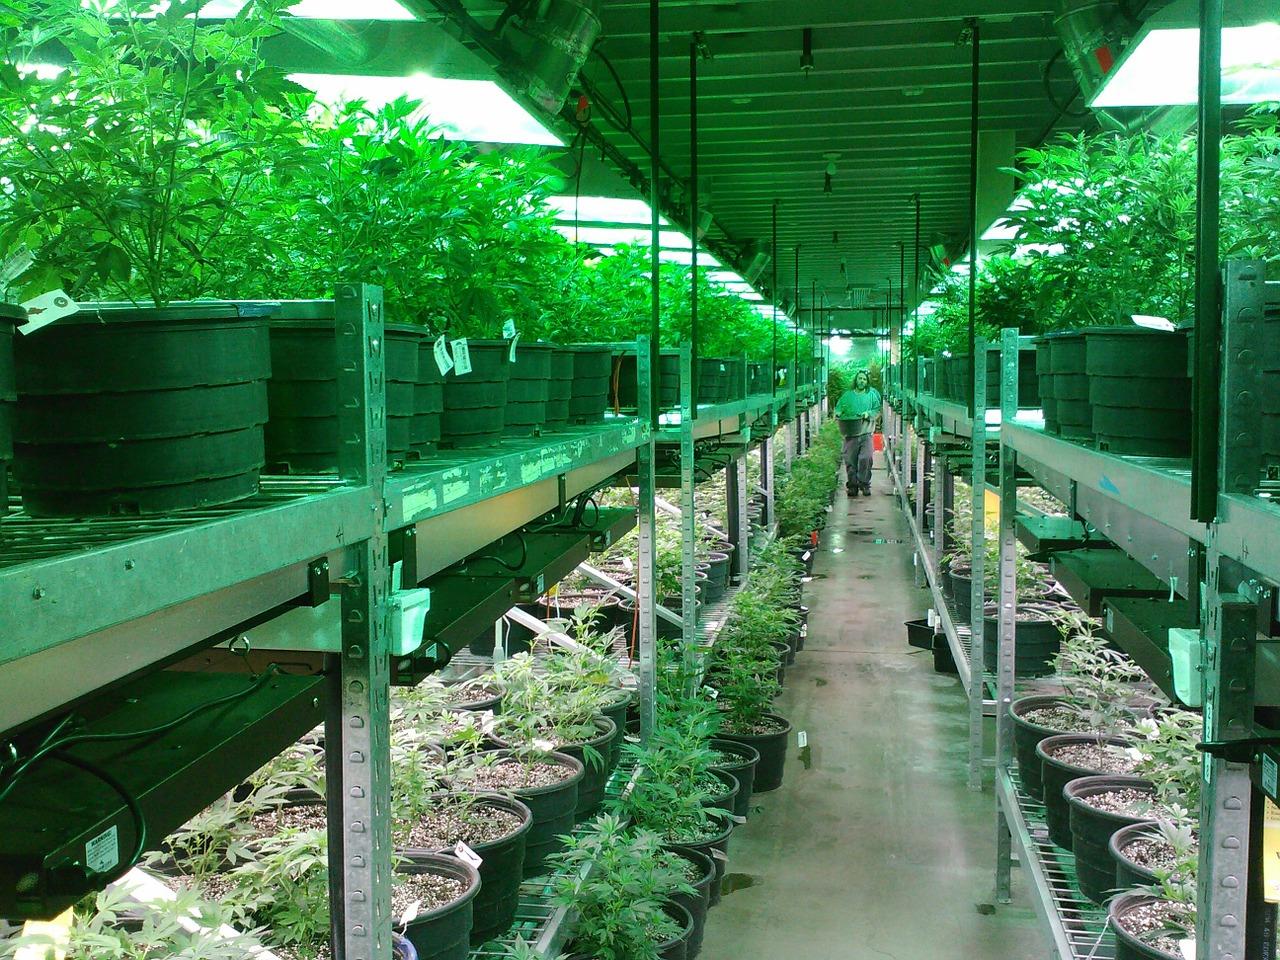 Marijuana,colorado marijuana grow,marijuana dispensary,growing marijuana,growing  cannabis - free image from needpix.com